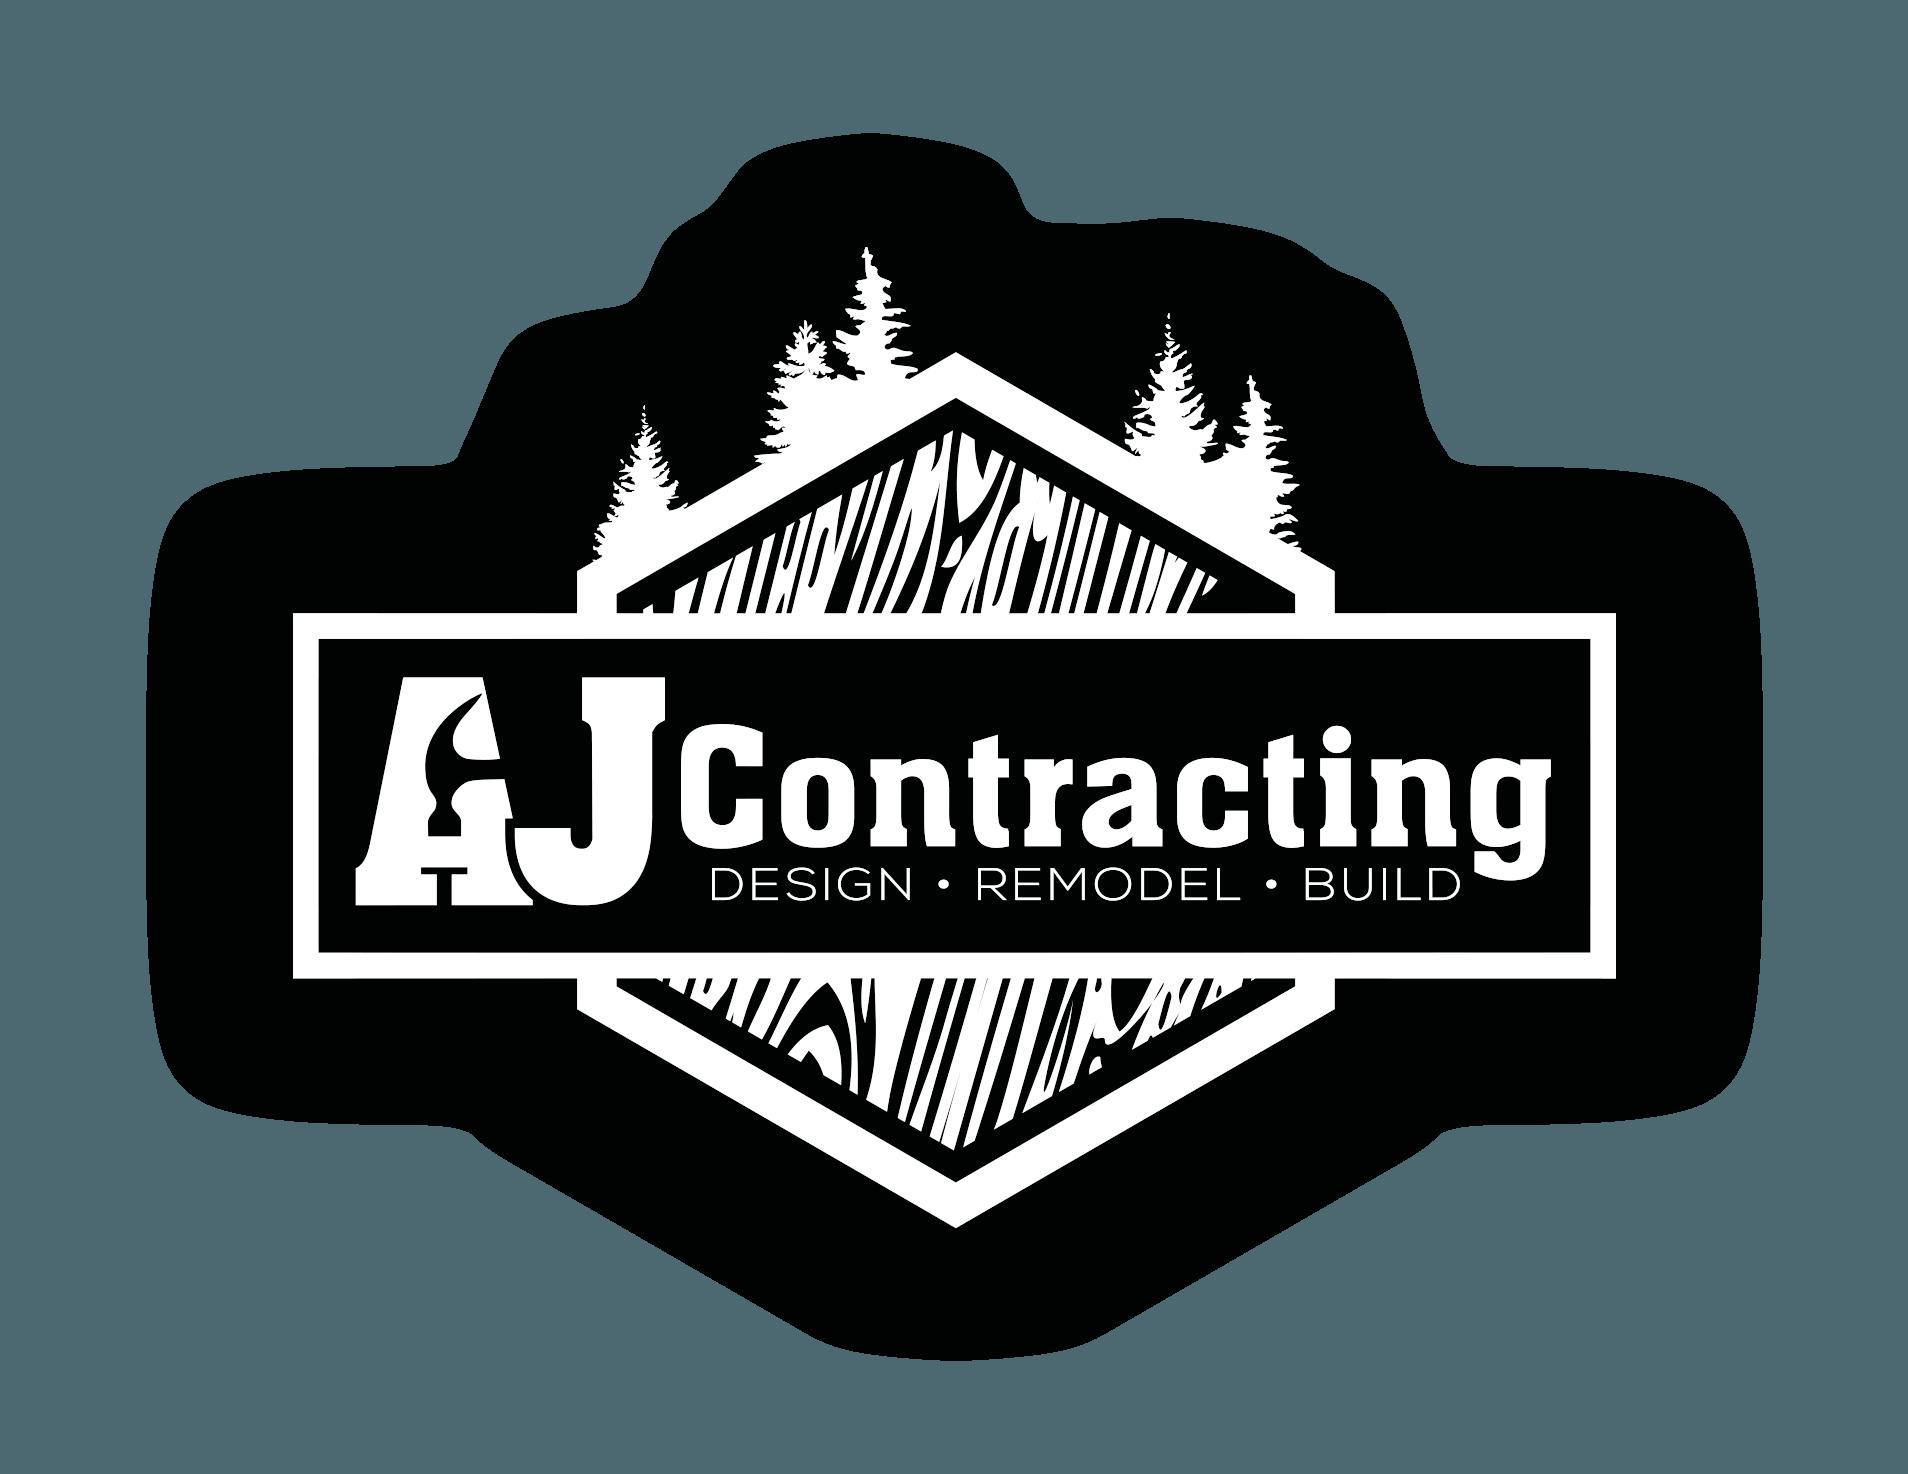 AJ Contracting - Residential Custom Home Design & Builder - Kingston, WA 98346